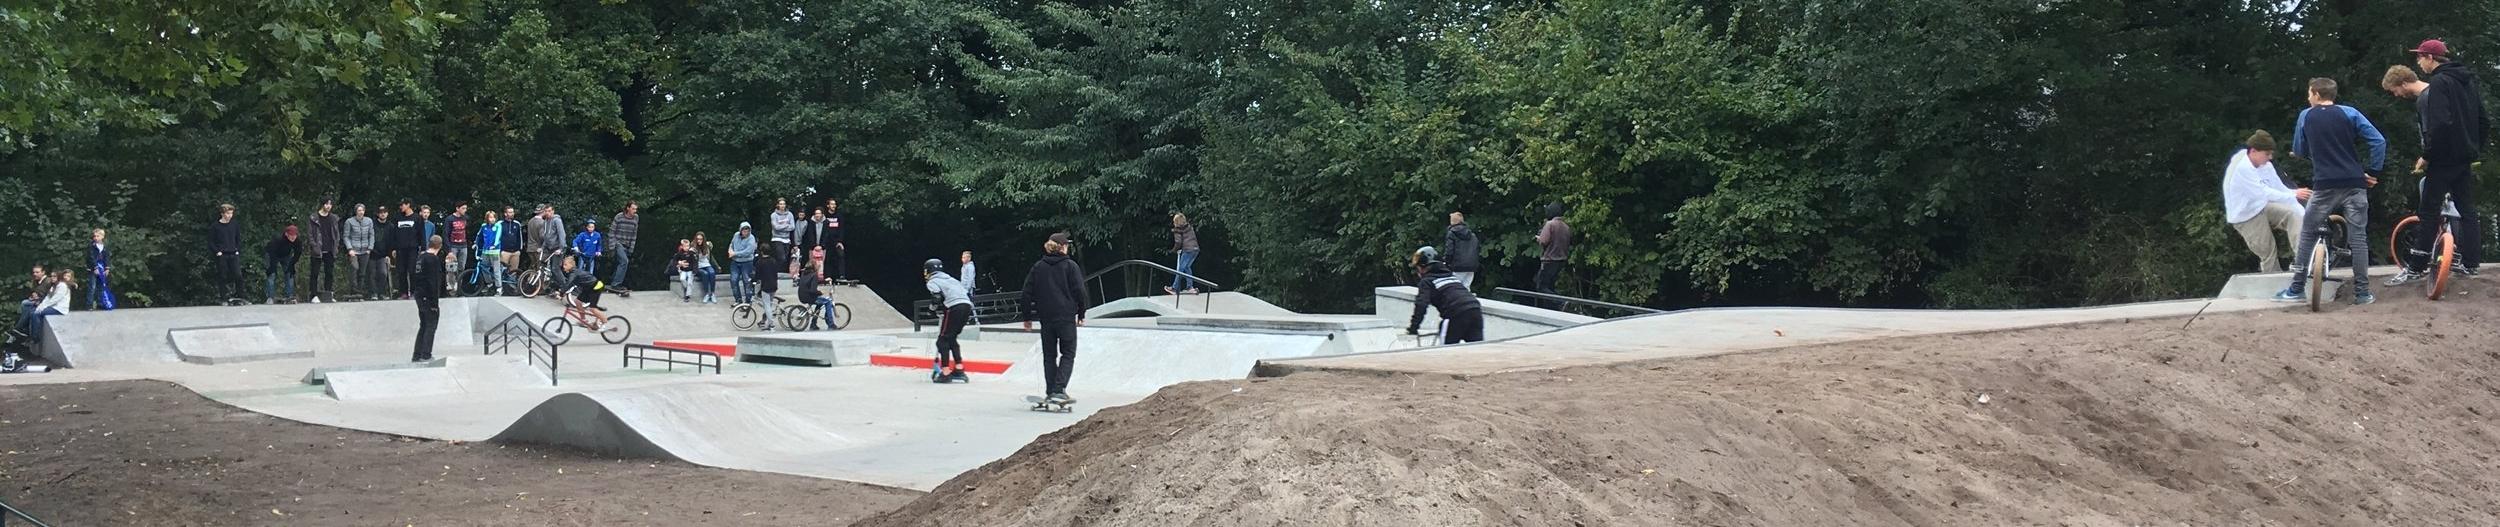 Skateparknunspeet